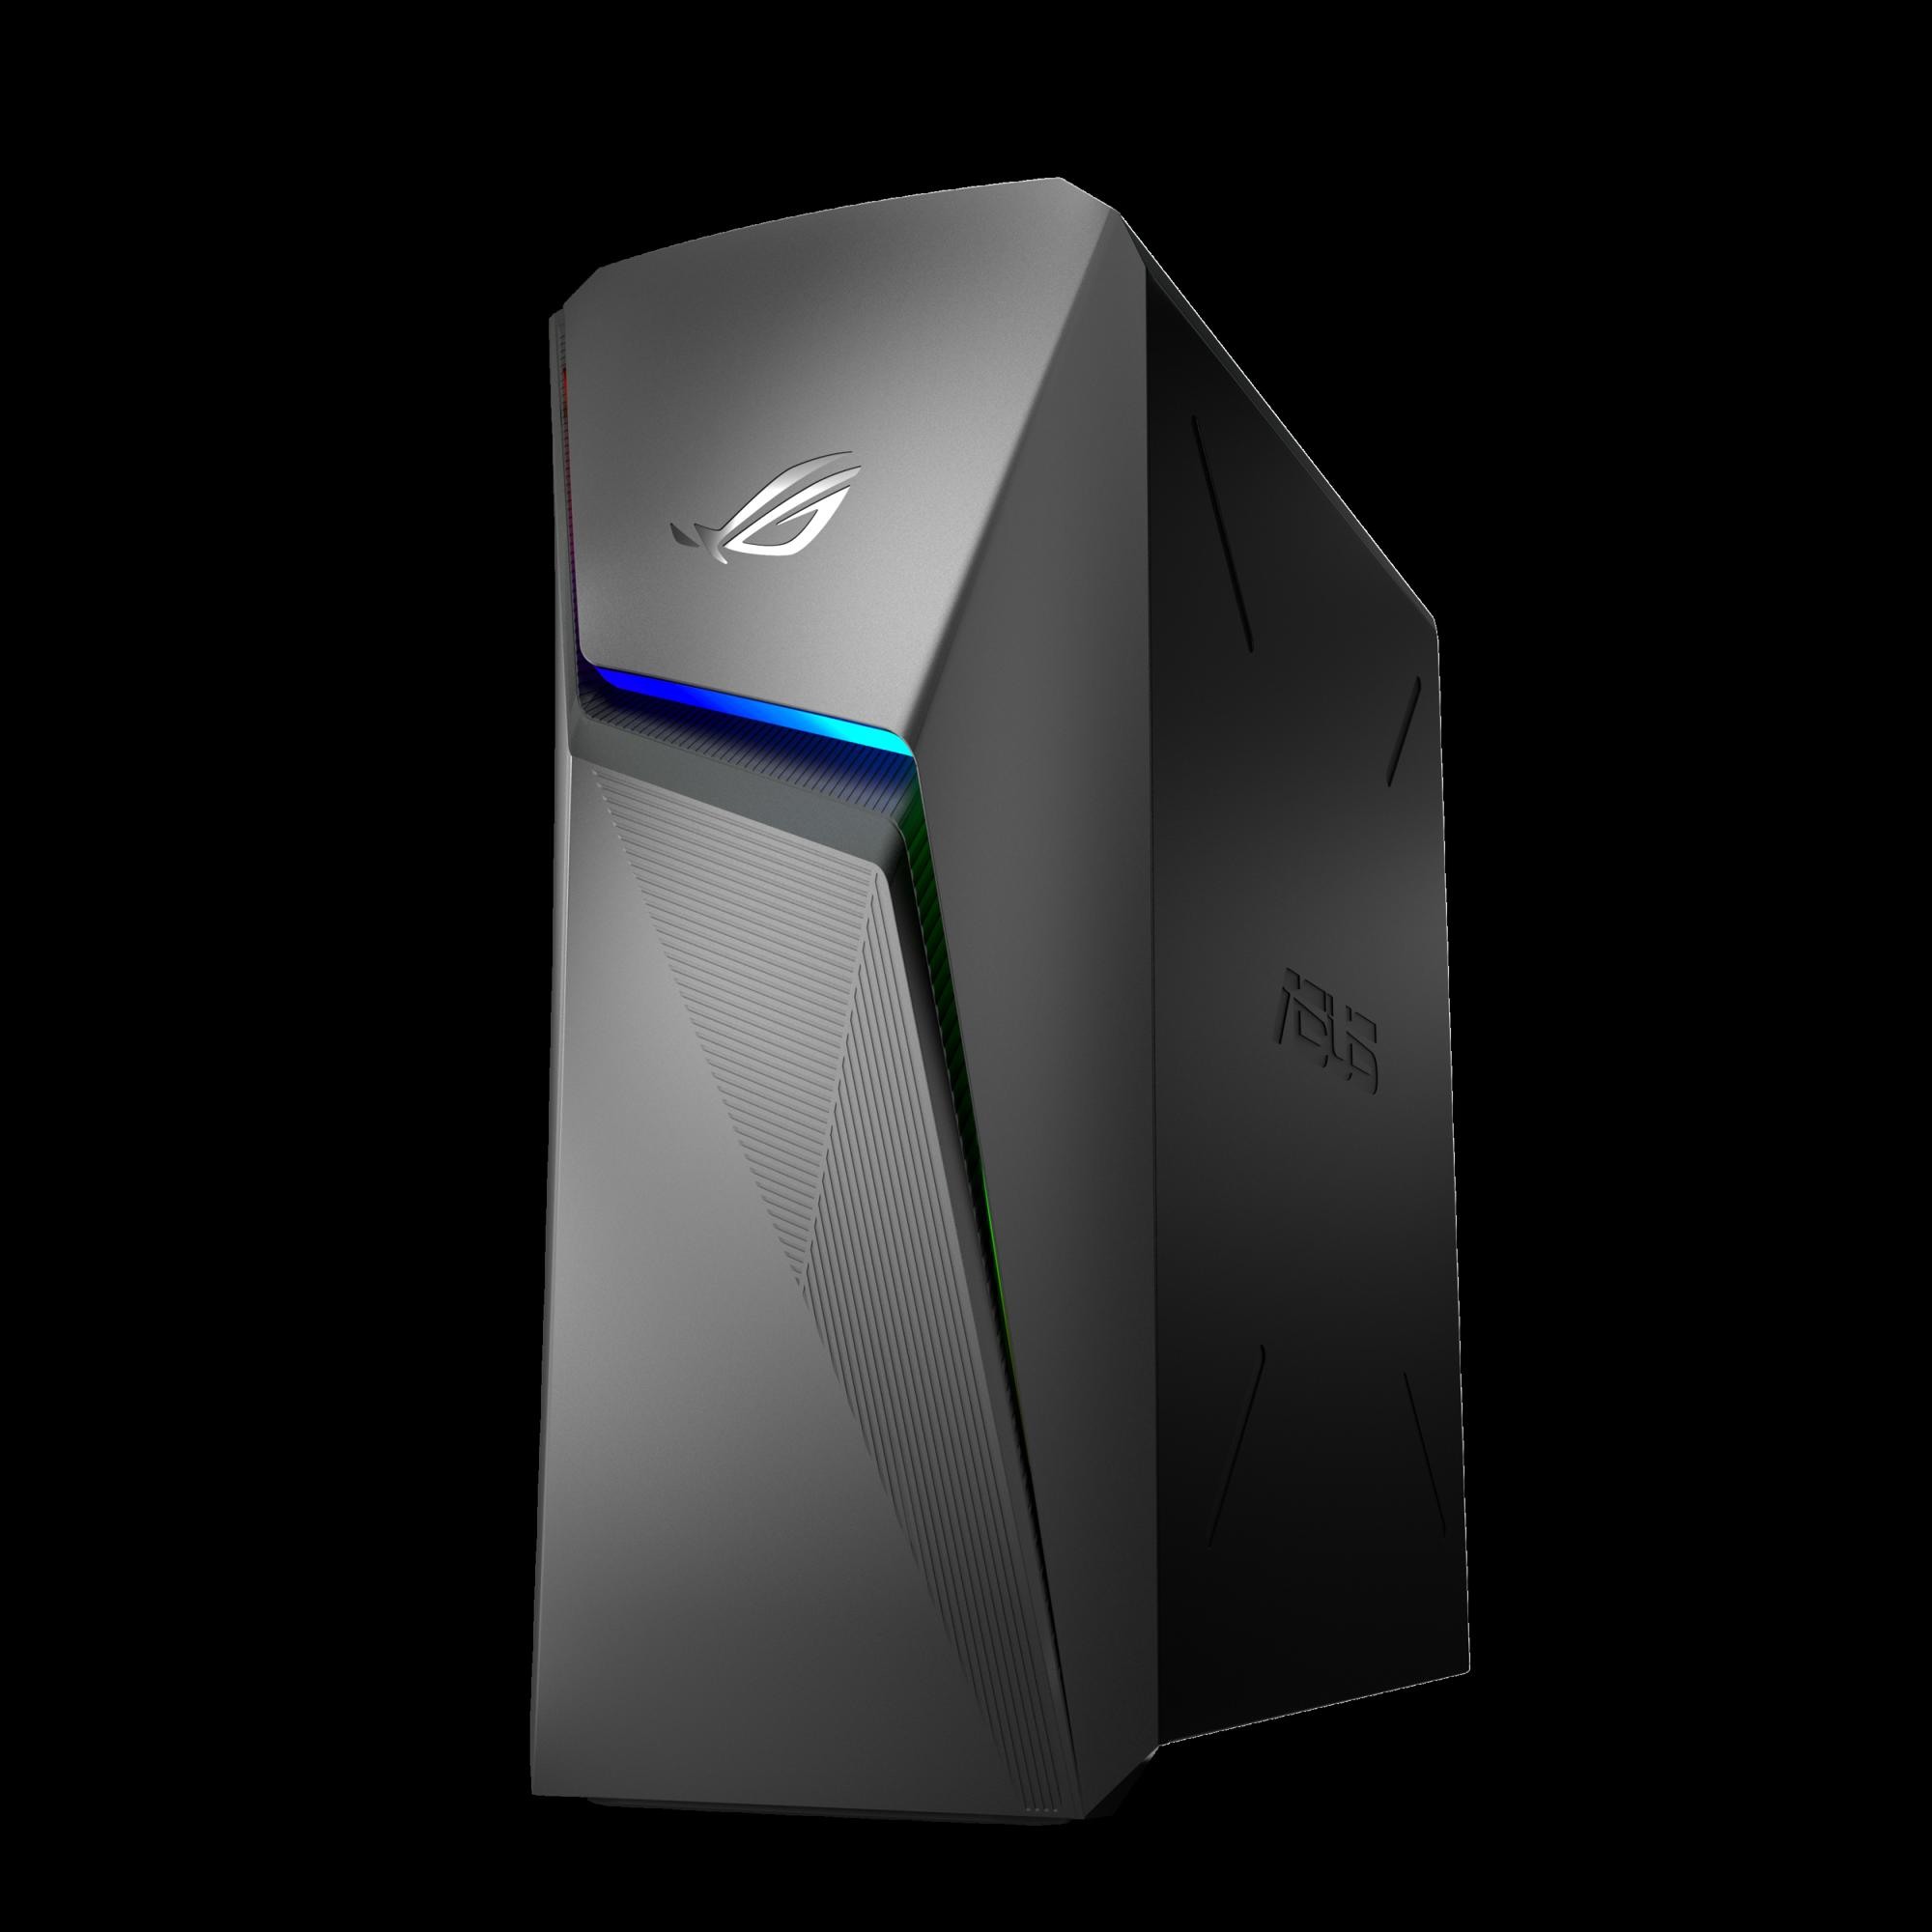 In Stock Again: ASUS ROG Strix G10DK Gaming Desktop, AMD Ryzen 7 5700G, NVIDIA GeForce RTX 2060 Super, 16GB DDR4 RAM, 256GB PCIe SSD + 1TB HDD, Windows 10 Home $999